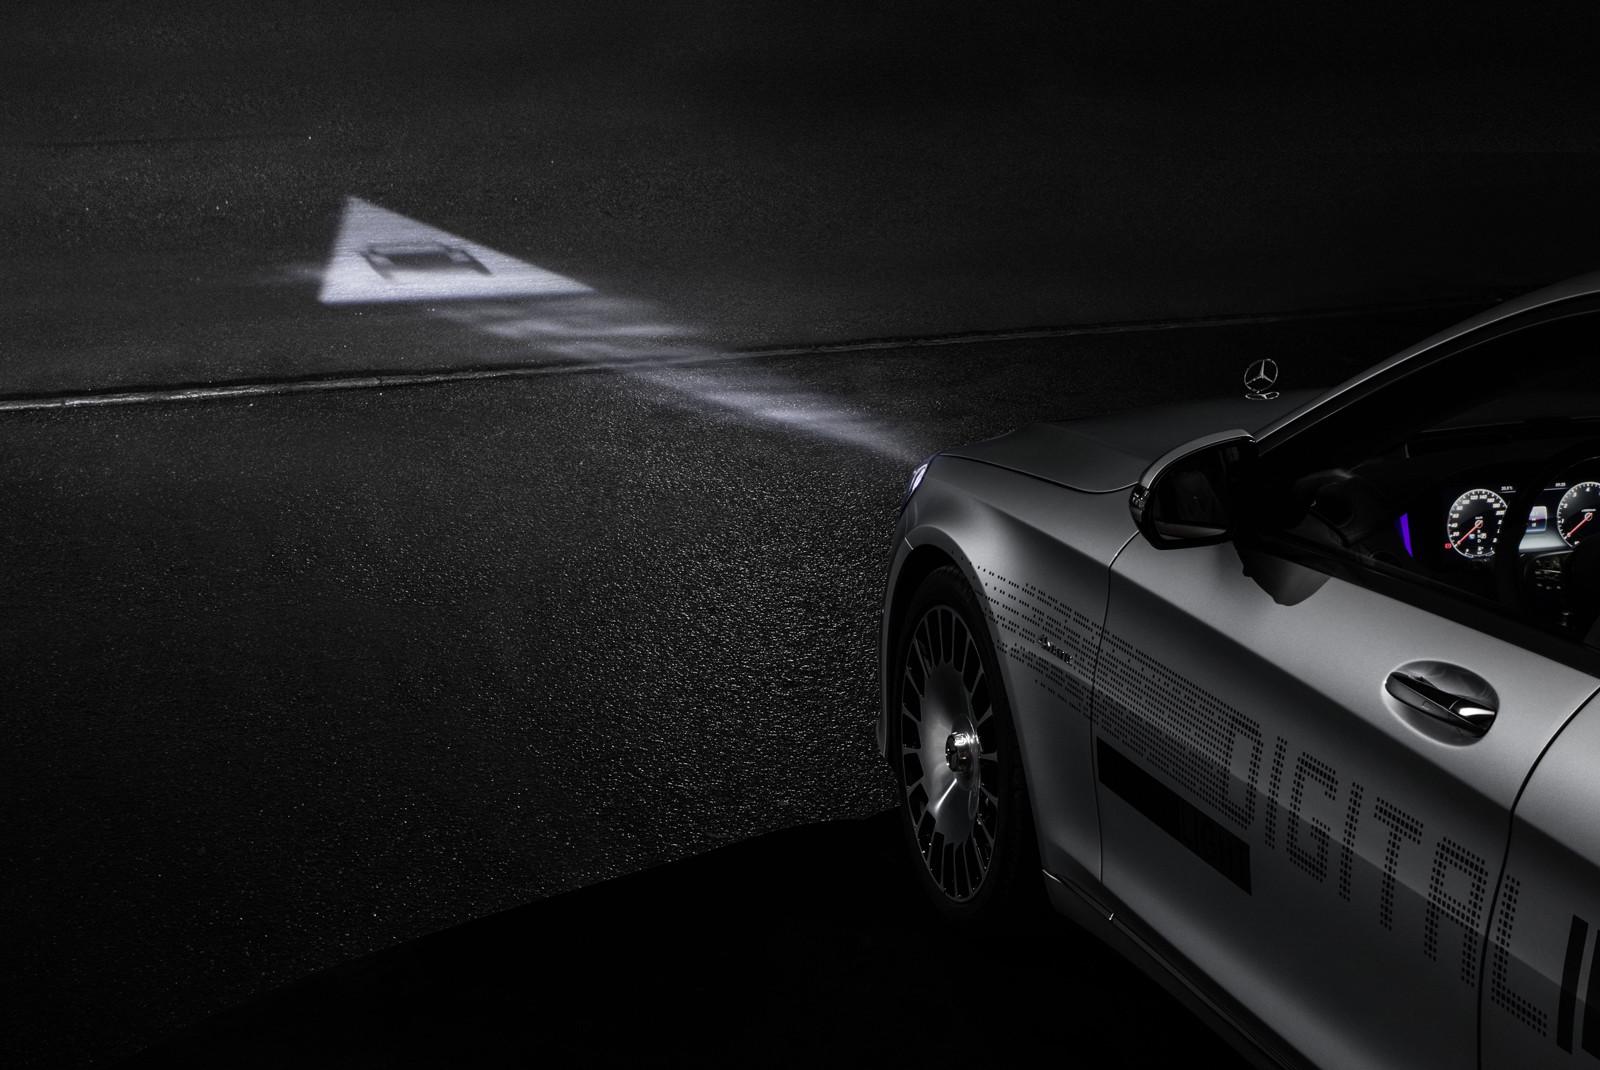 DIGITAL LIGHT de Mercedes-Benz